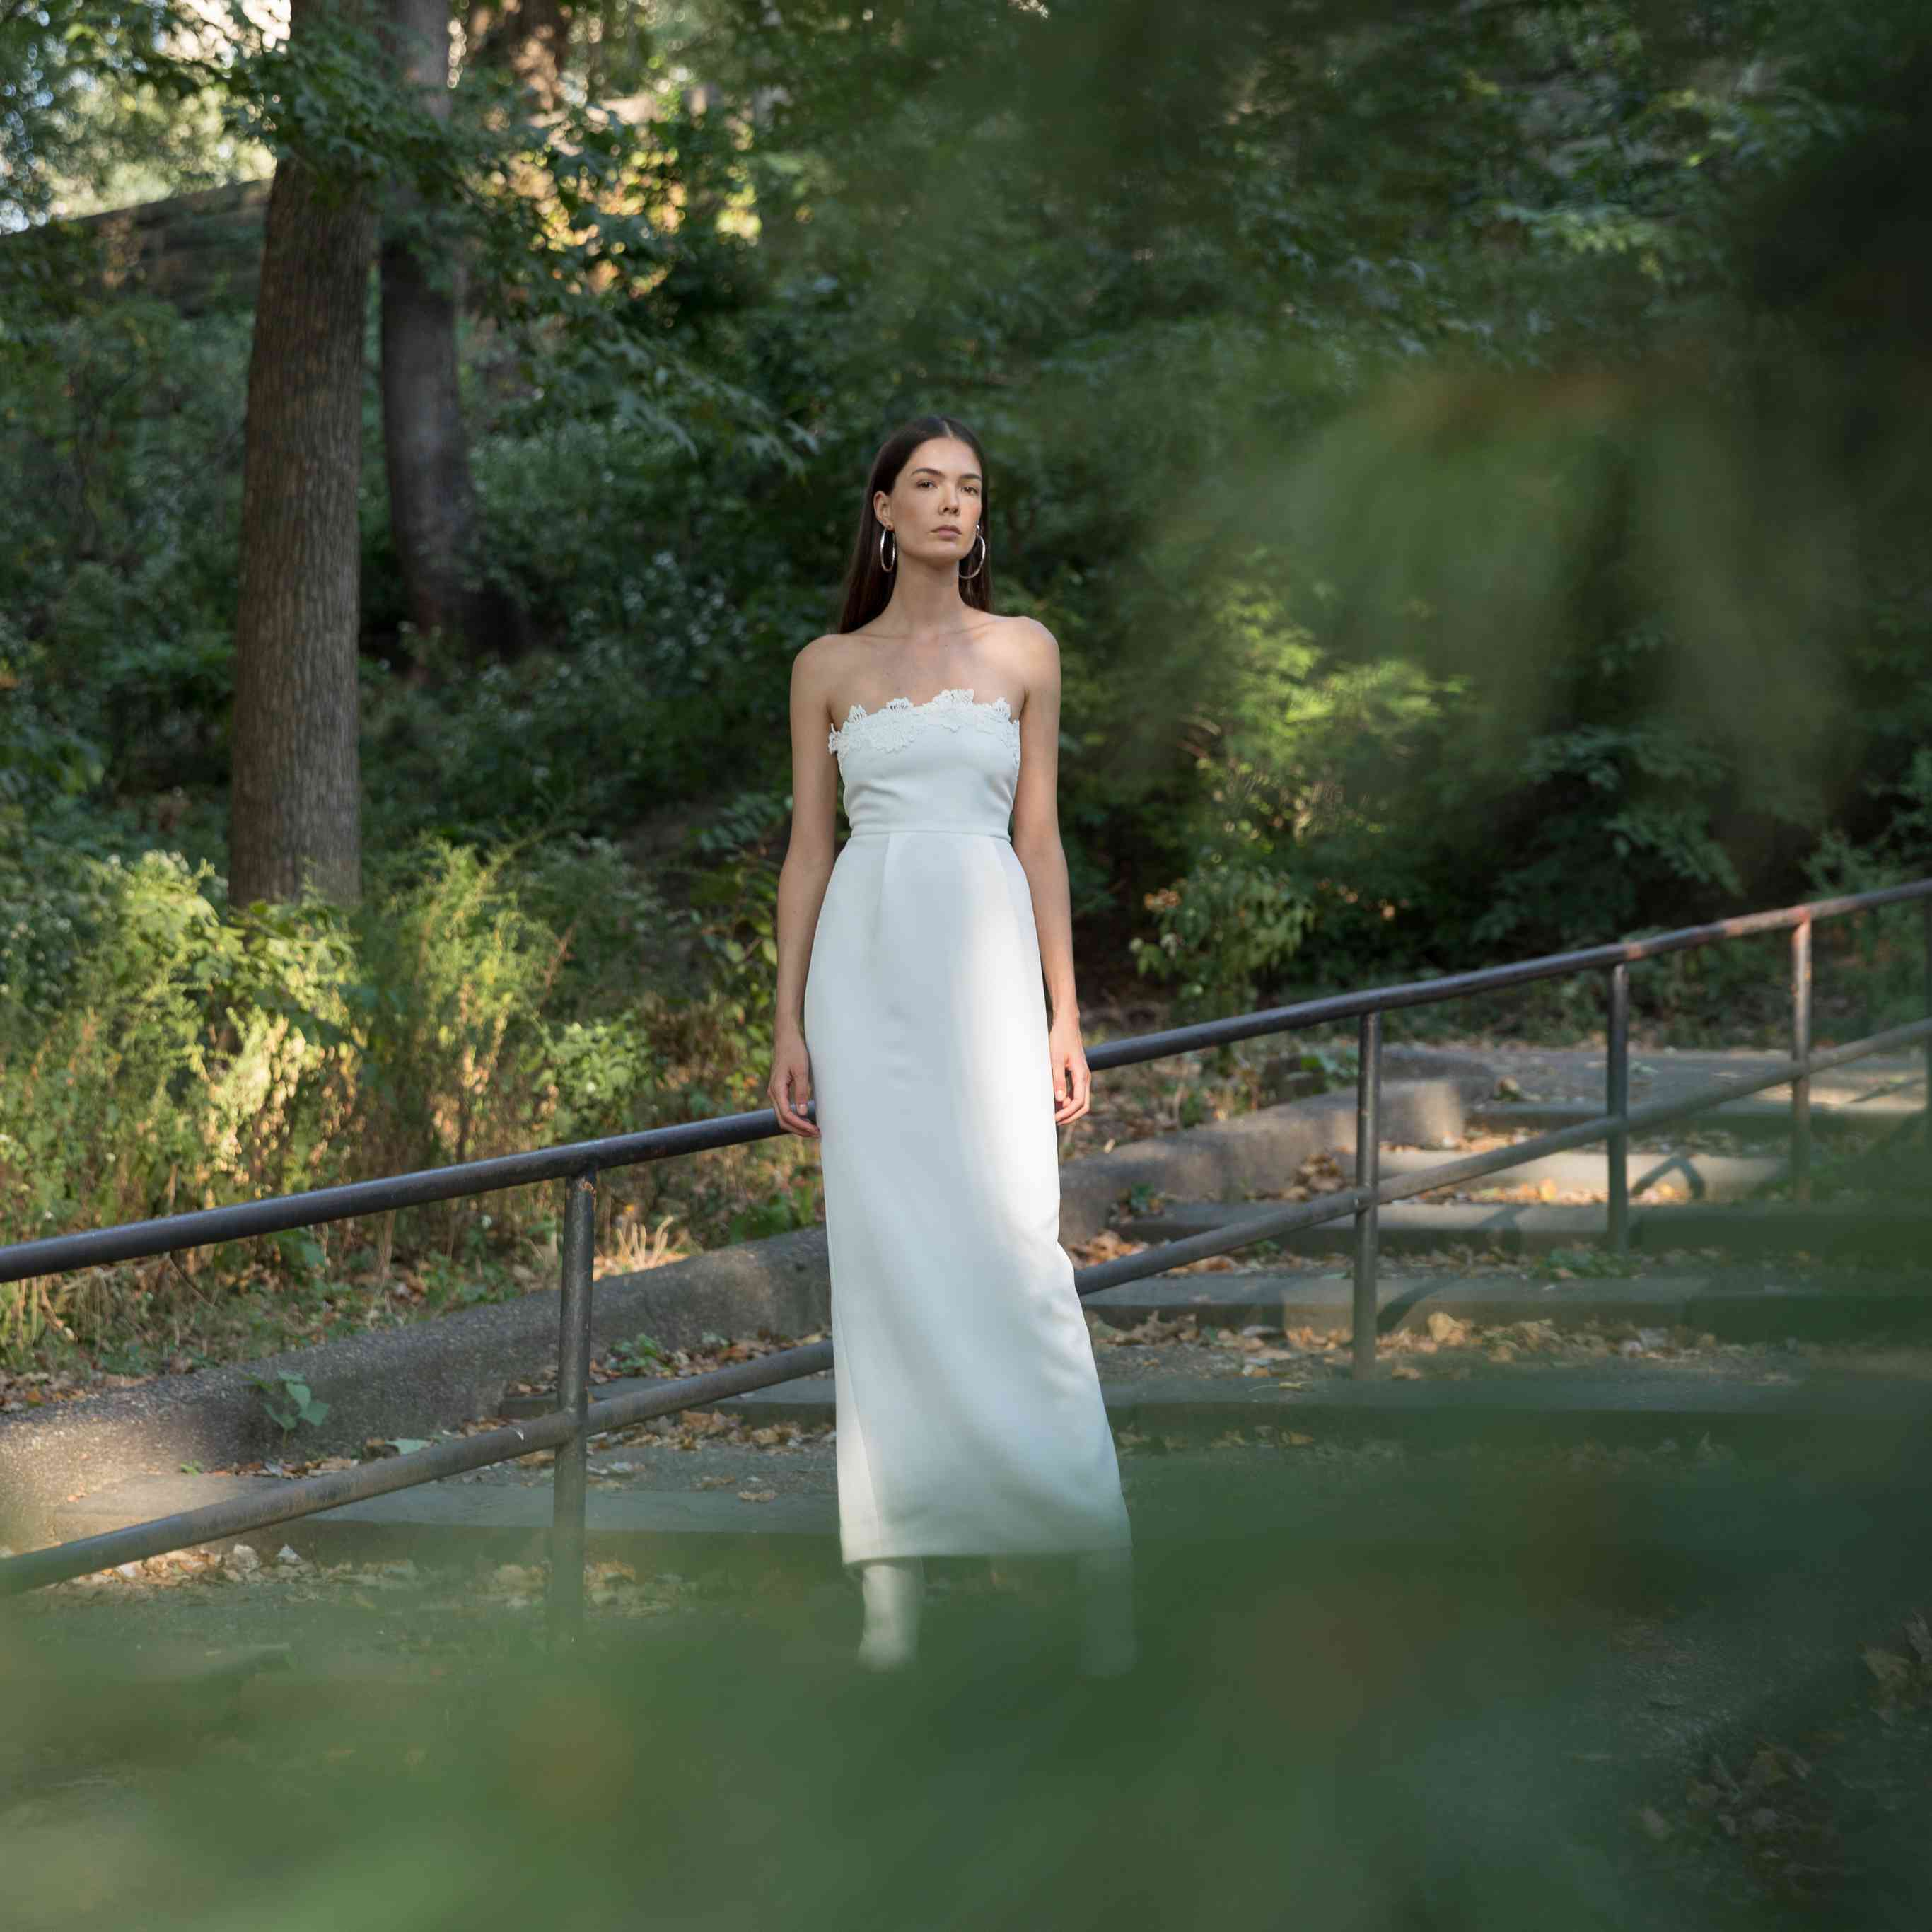 Model in strapless tulip wedding dress